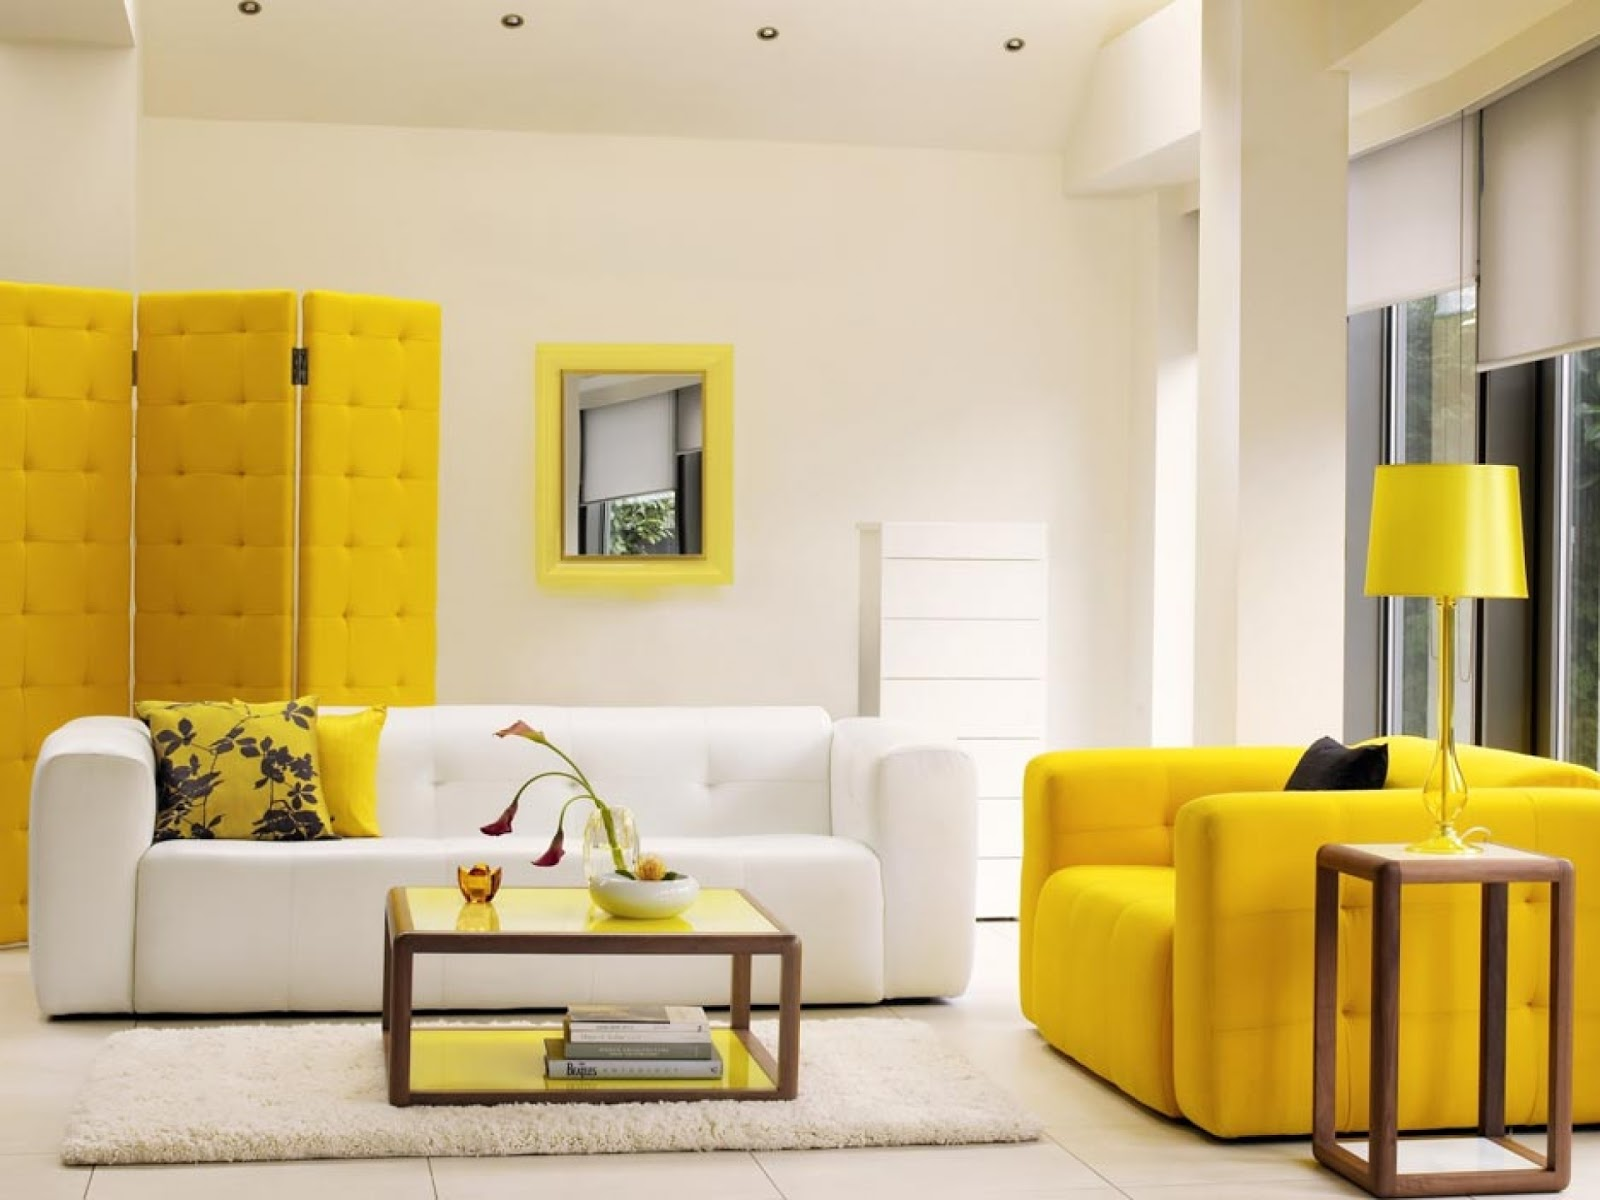 Image result for emphasis in interior design